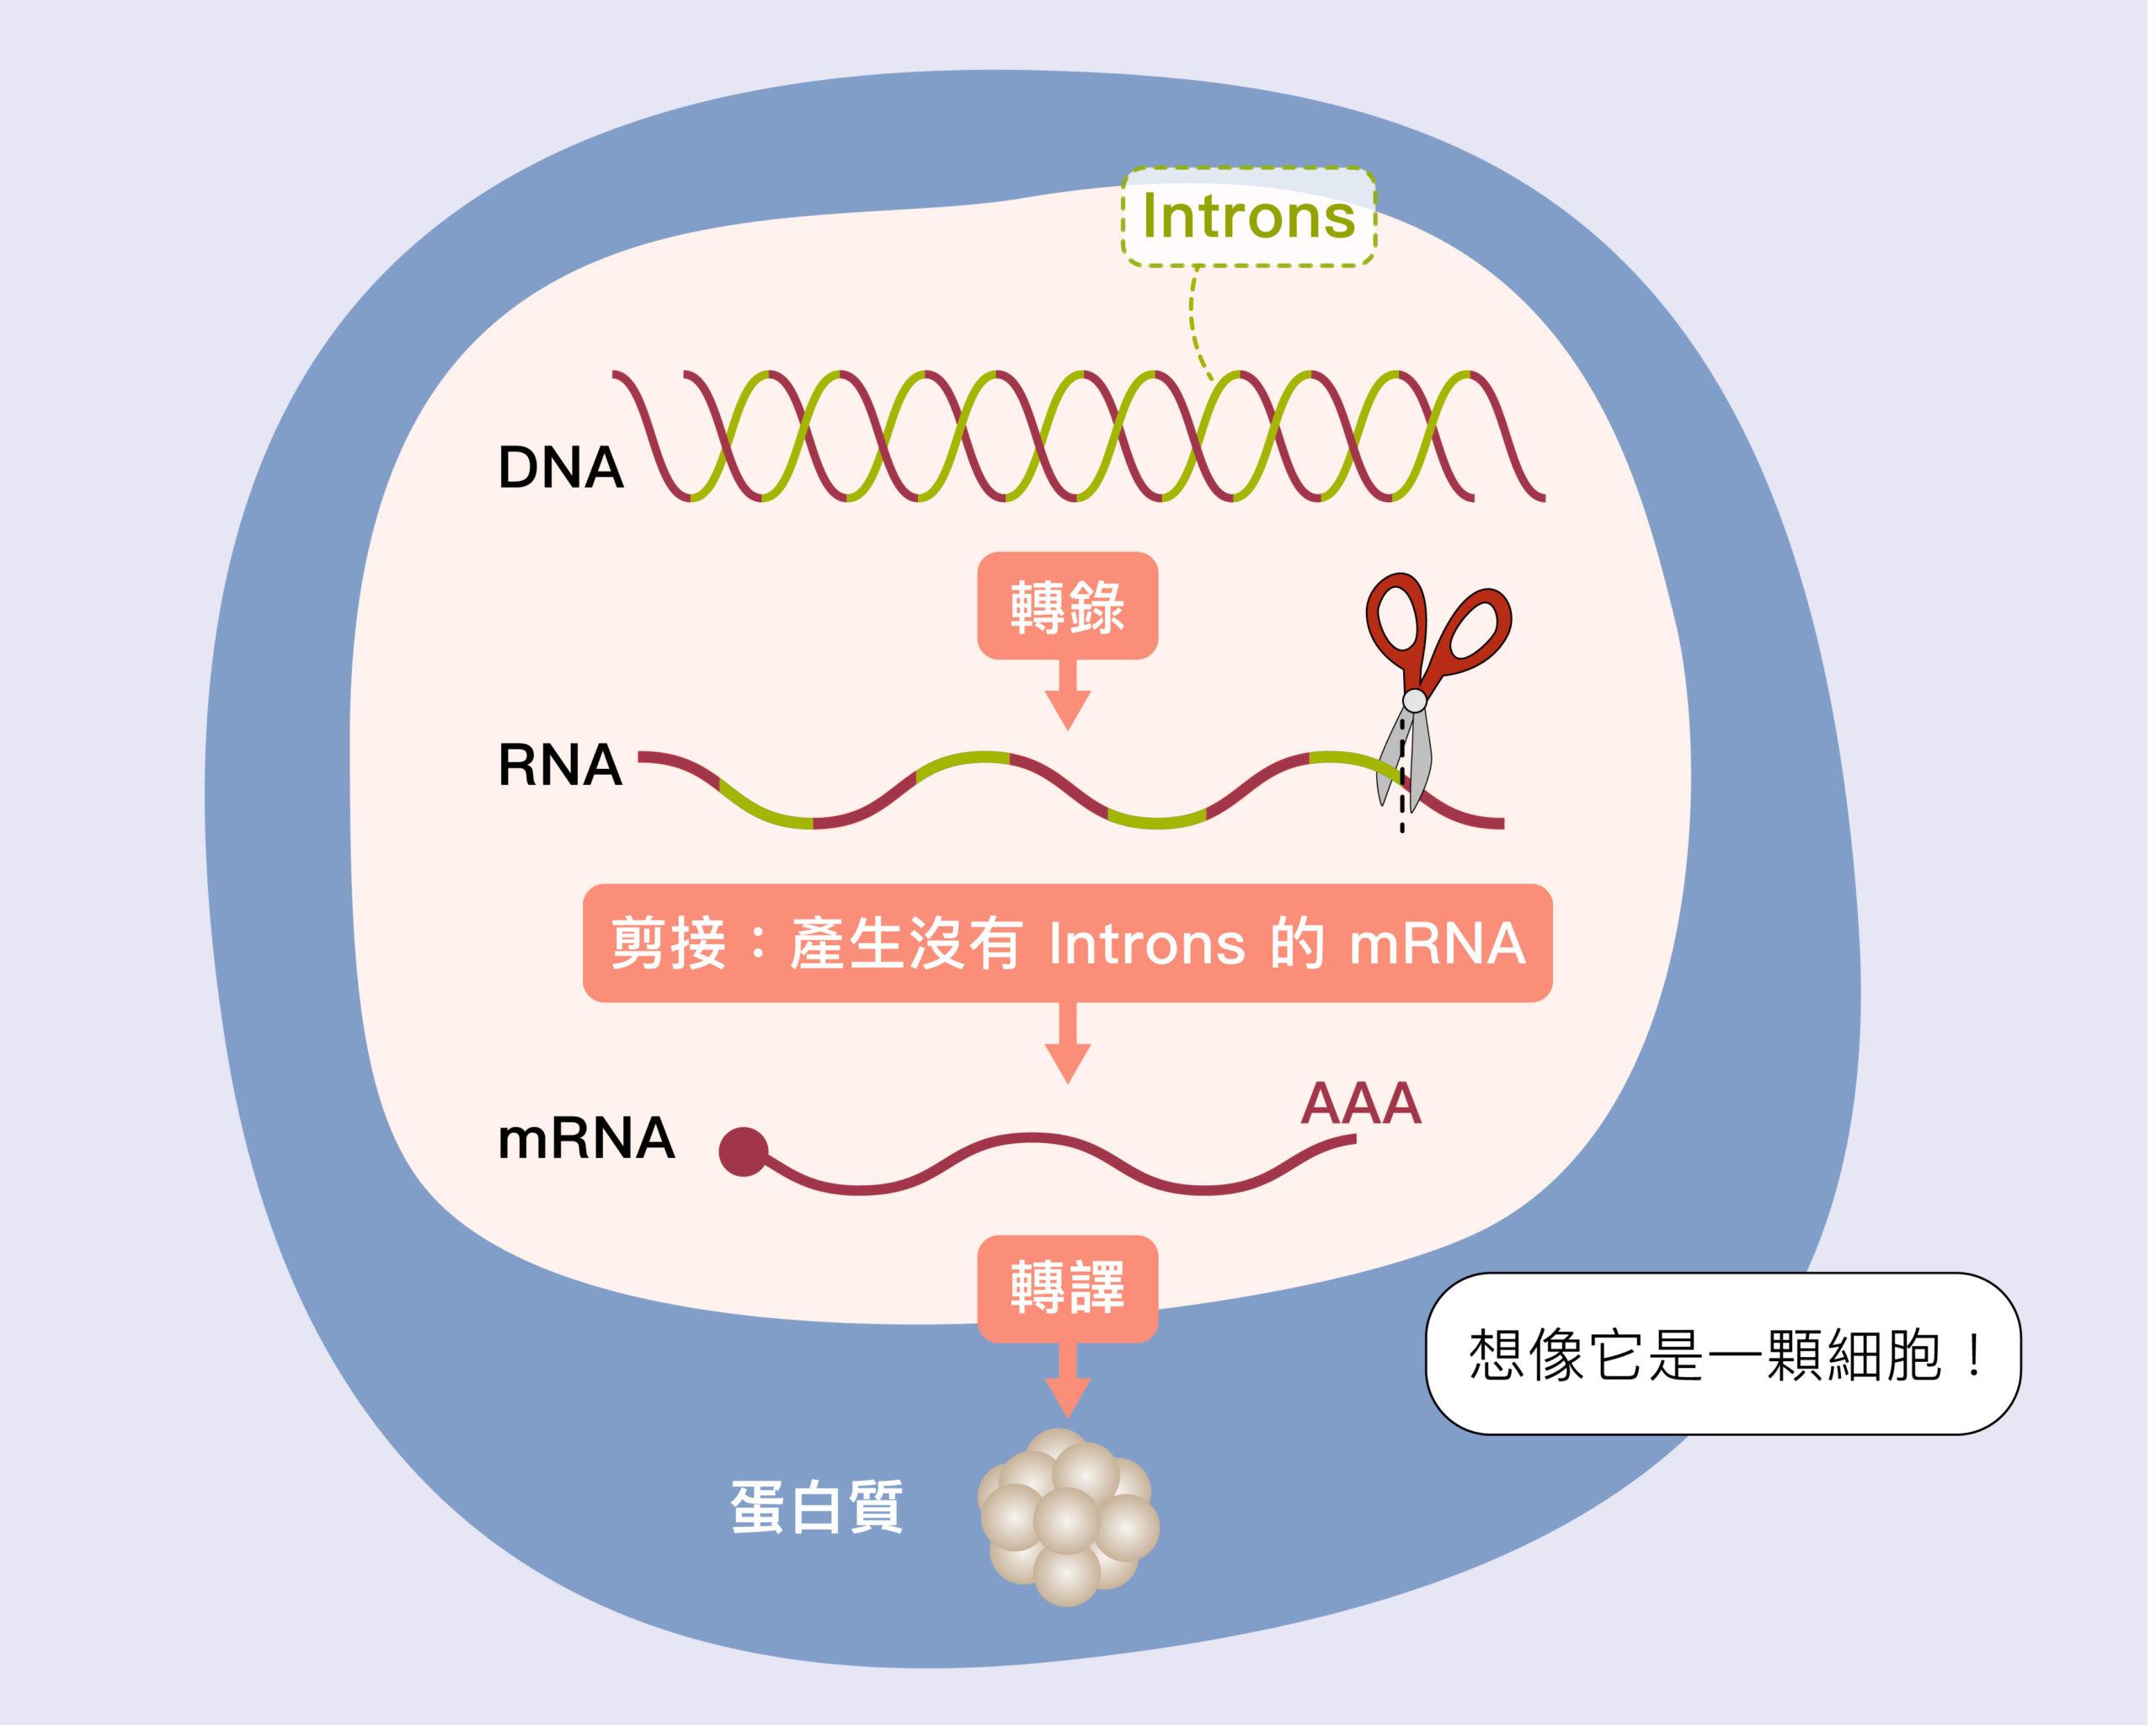 DNA 基因不是呈連續性的,中間穿插一些不需要的片段稱為內含子 (introns),轉錄後的 RNA 必須剪去中間不需要的部分,把有用片段接起來,變成信使 RNA (mRNA),細胞才能根據它製作蛋白質。圖│研之有物(資料來源│張典顯)